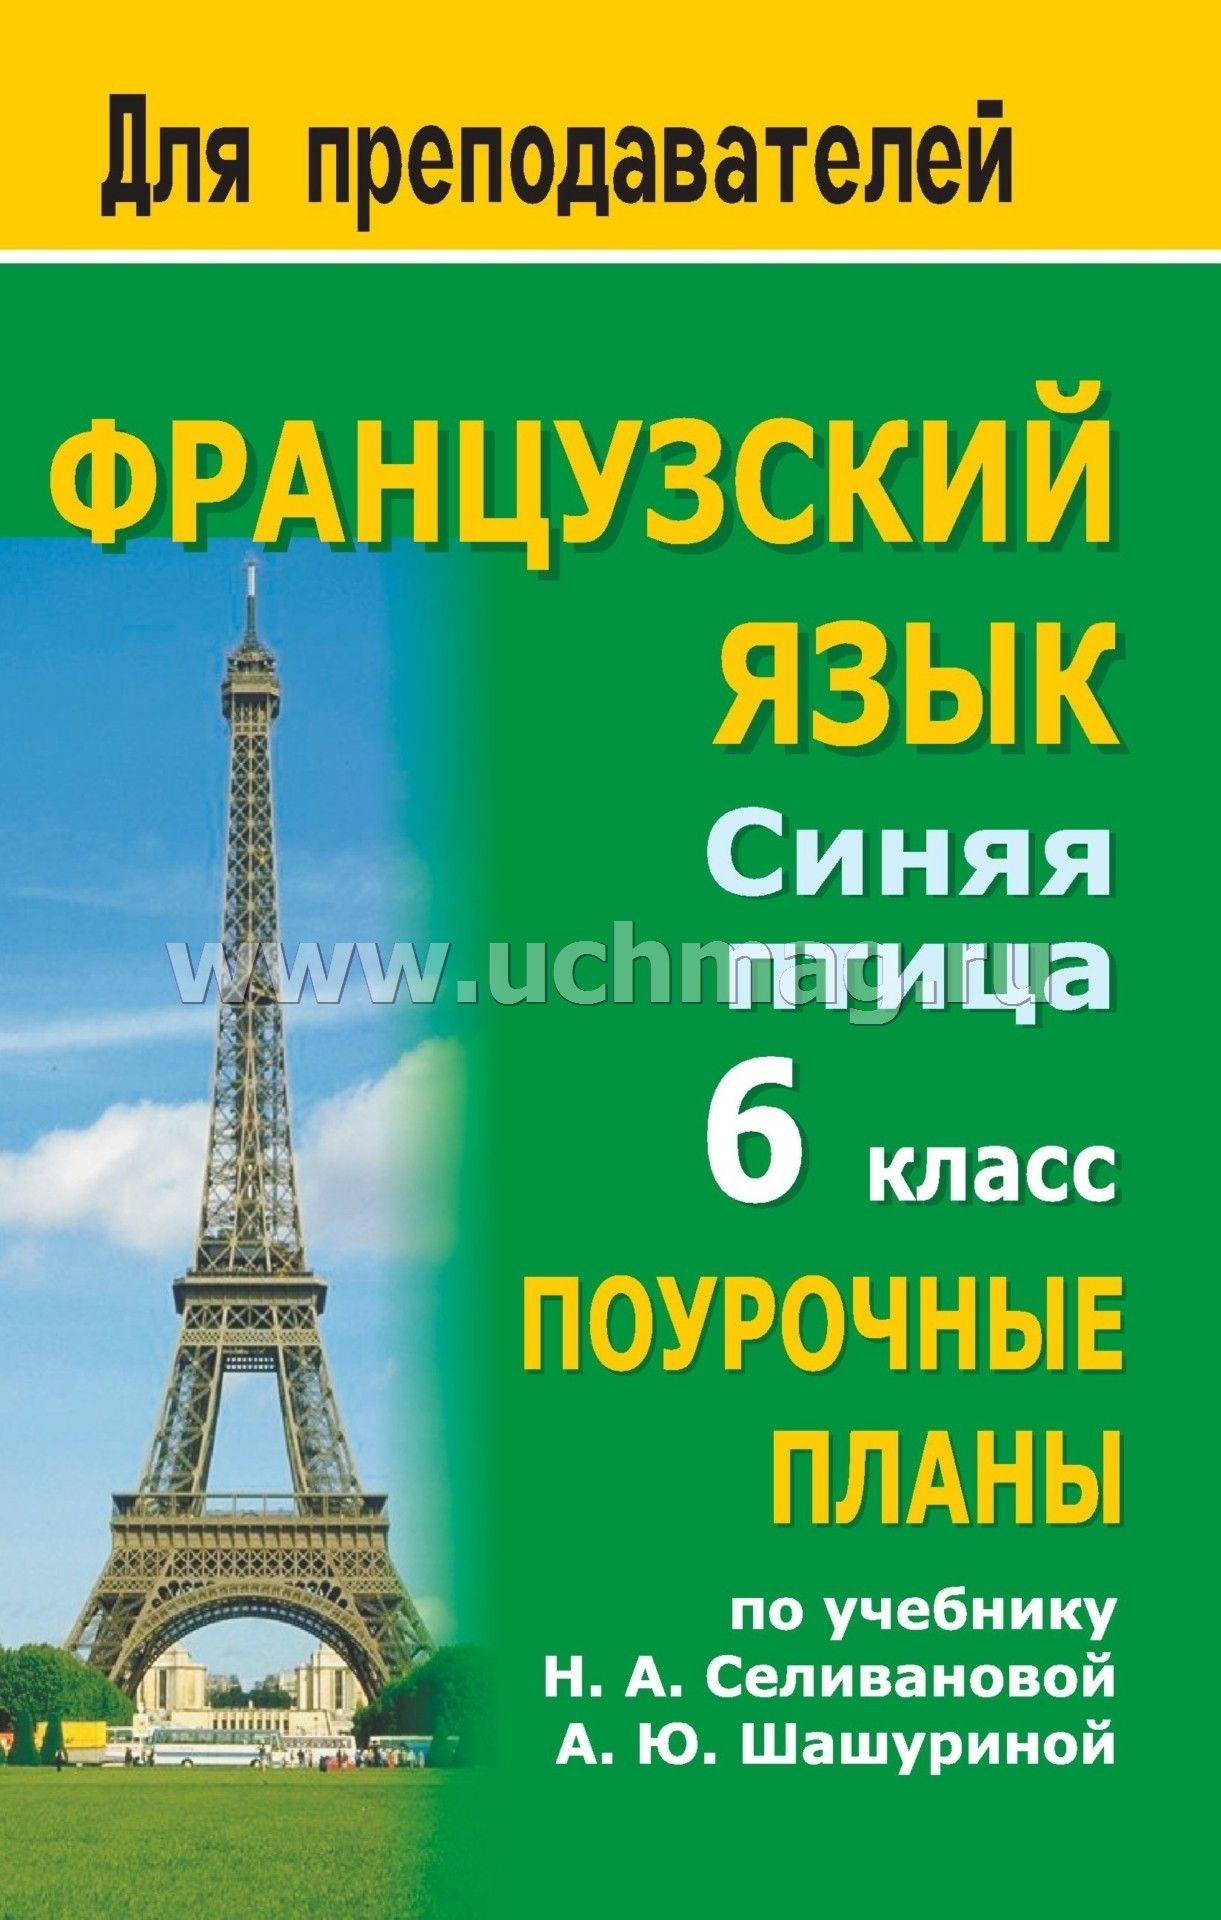 Текст из учебника по французскому языку н а селиванова а ю шашурина 7класса